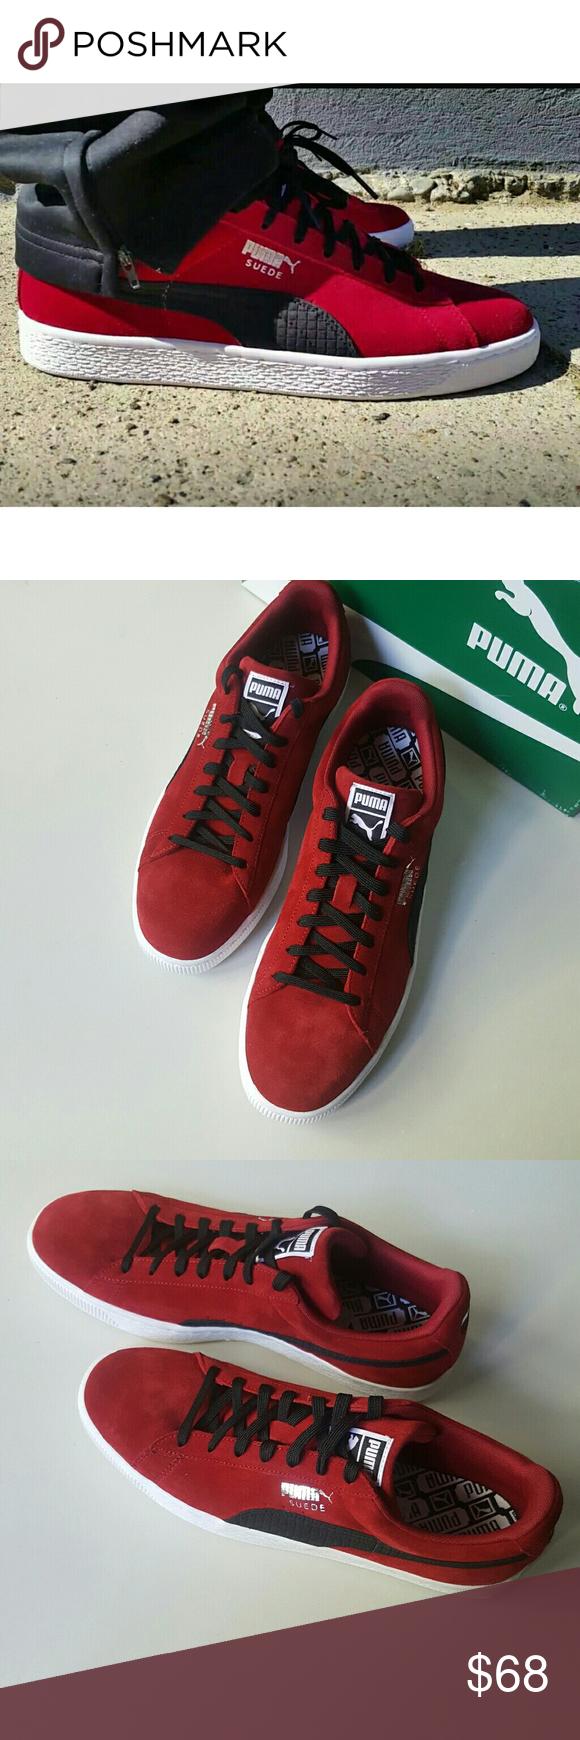 Puma Rio Red Suede Sneakers Red Suede Suede Sneakers Suede